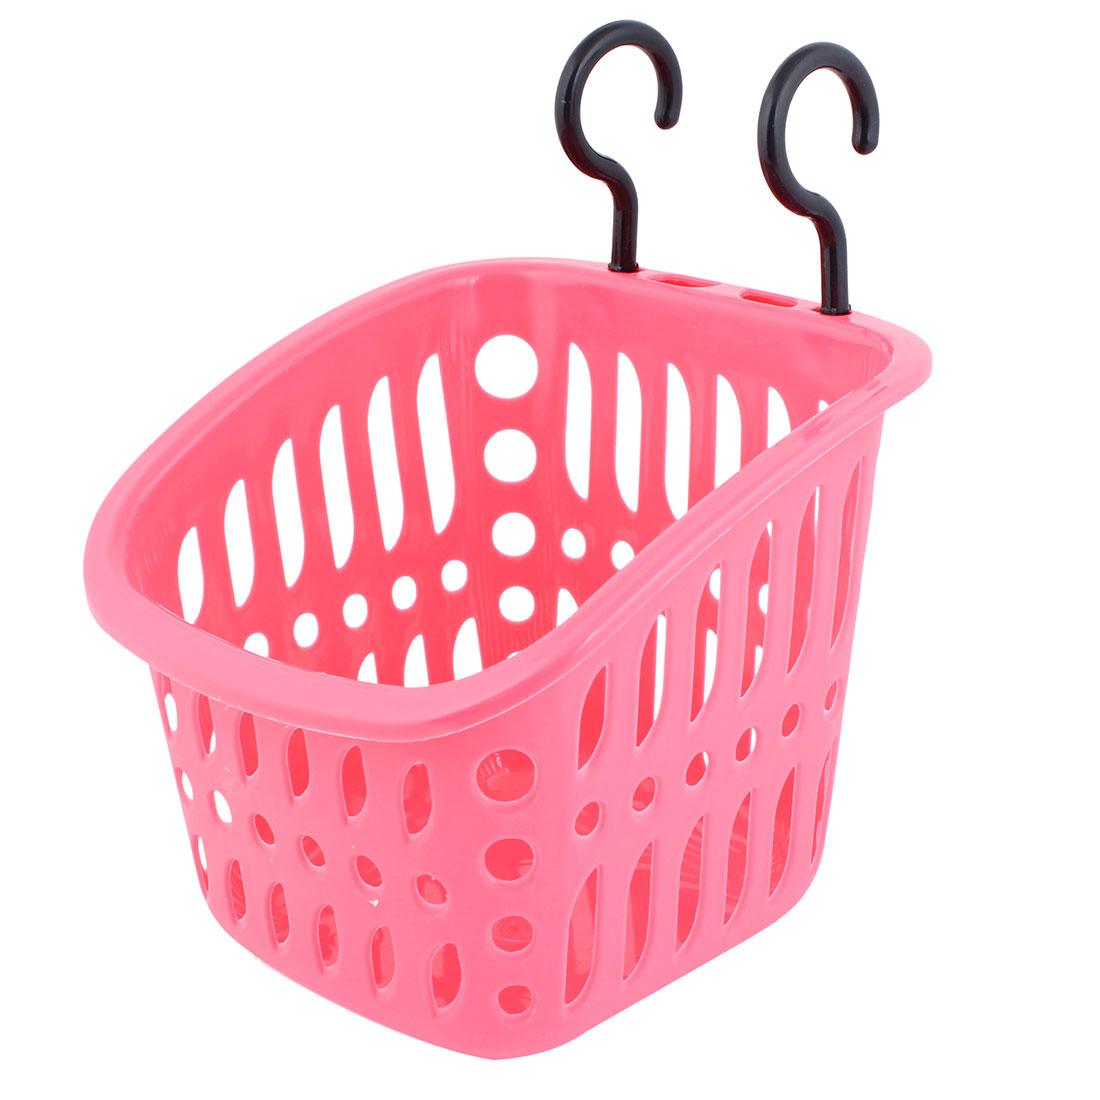 Fuchsia Plastic Hollow Household Storage Basket + Hooks